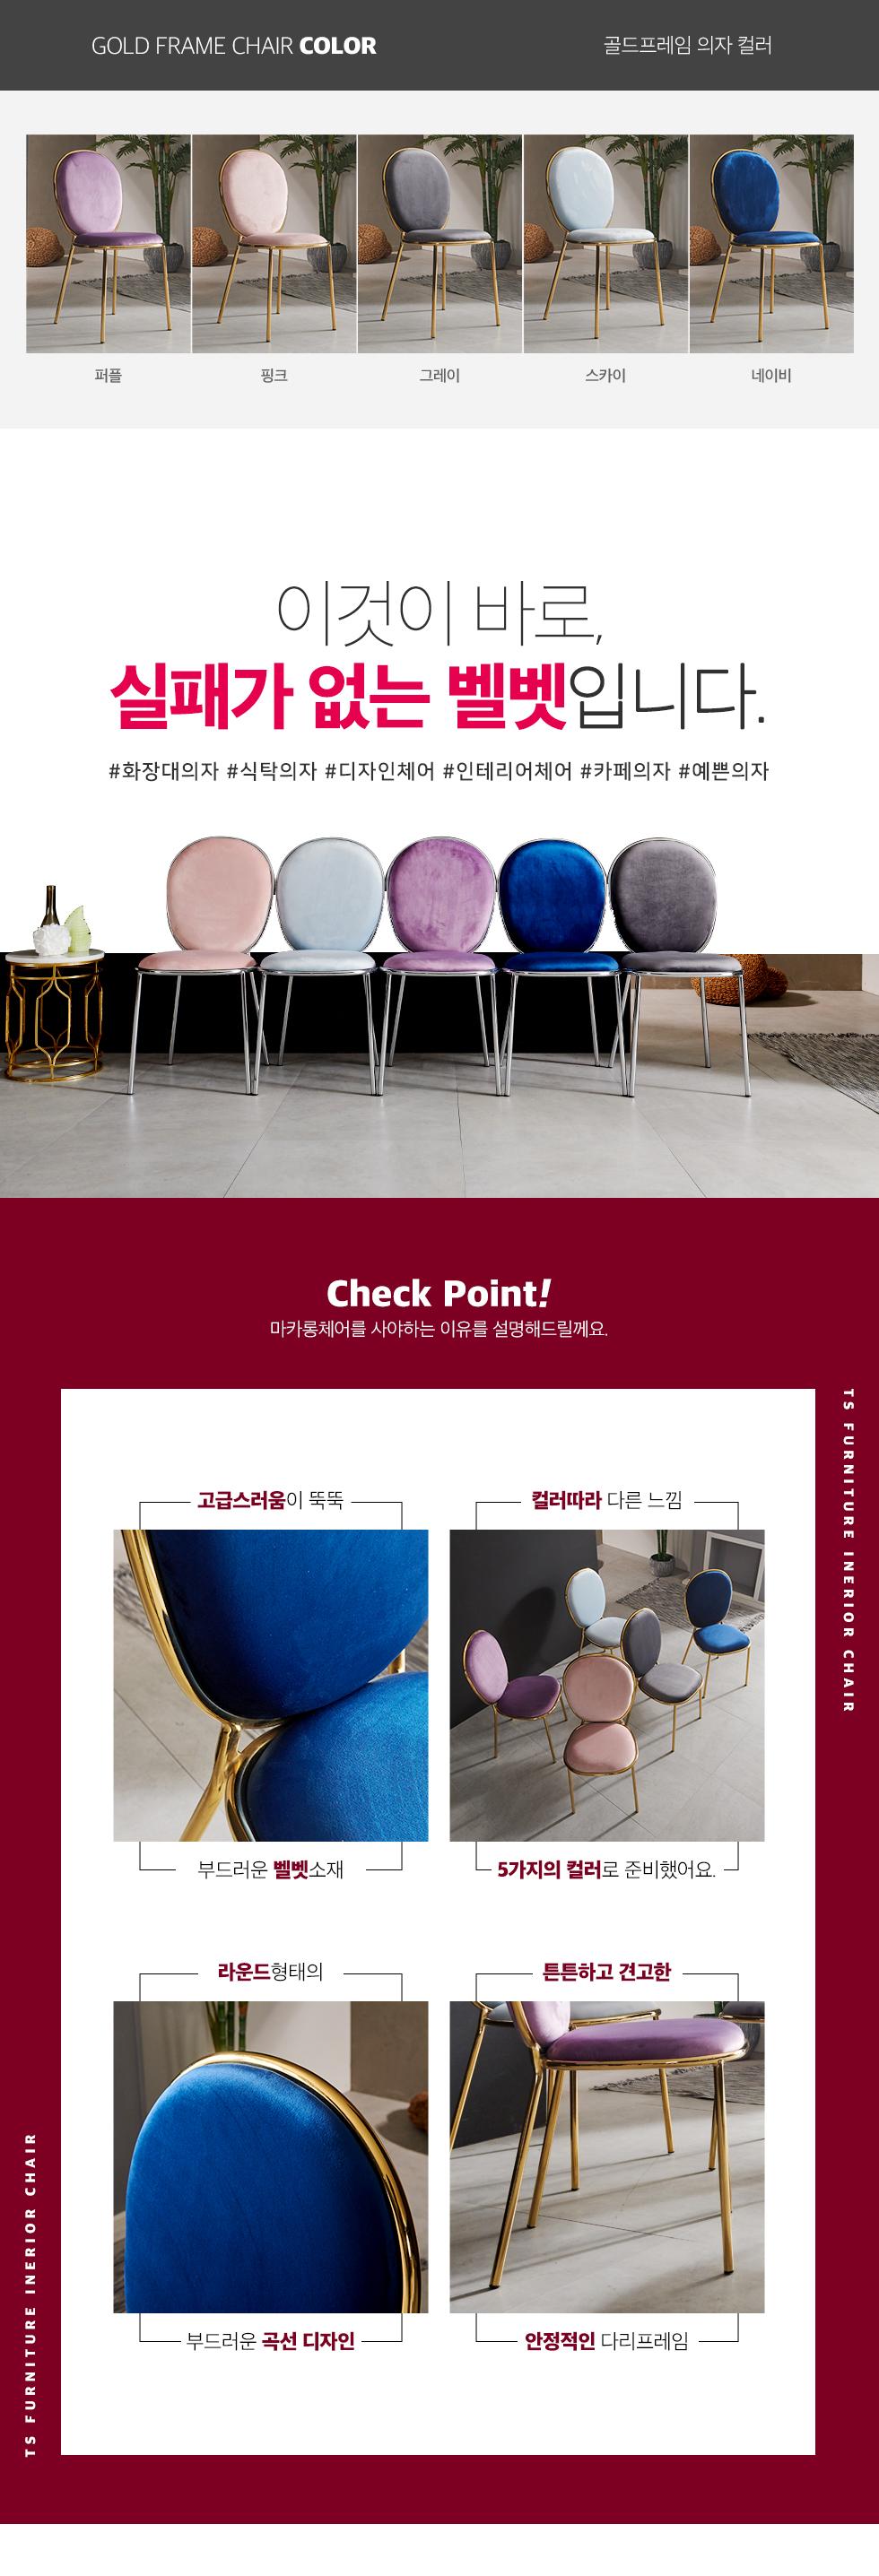 TS 마카롱 실버 체어 - 티에스퍼니처, 92,000원, 디자인 의자, 스틸의자